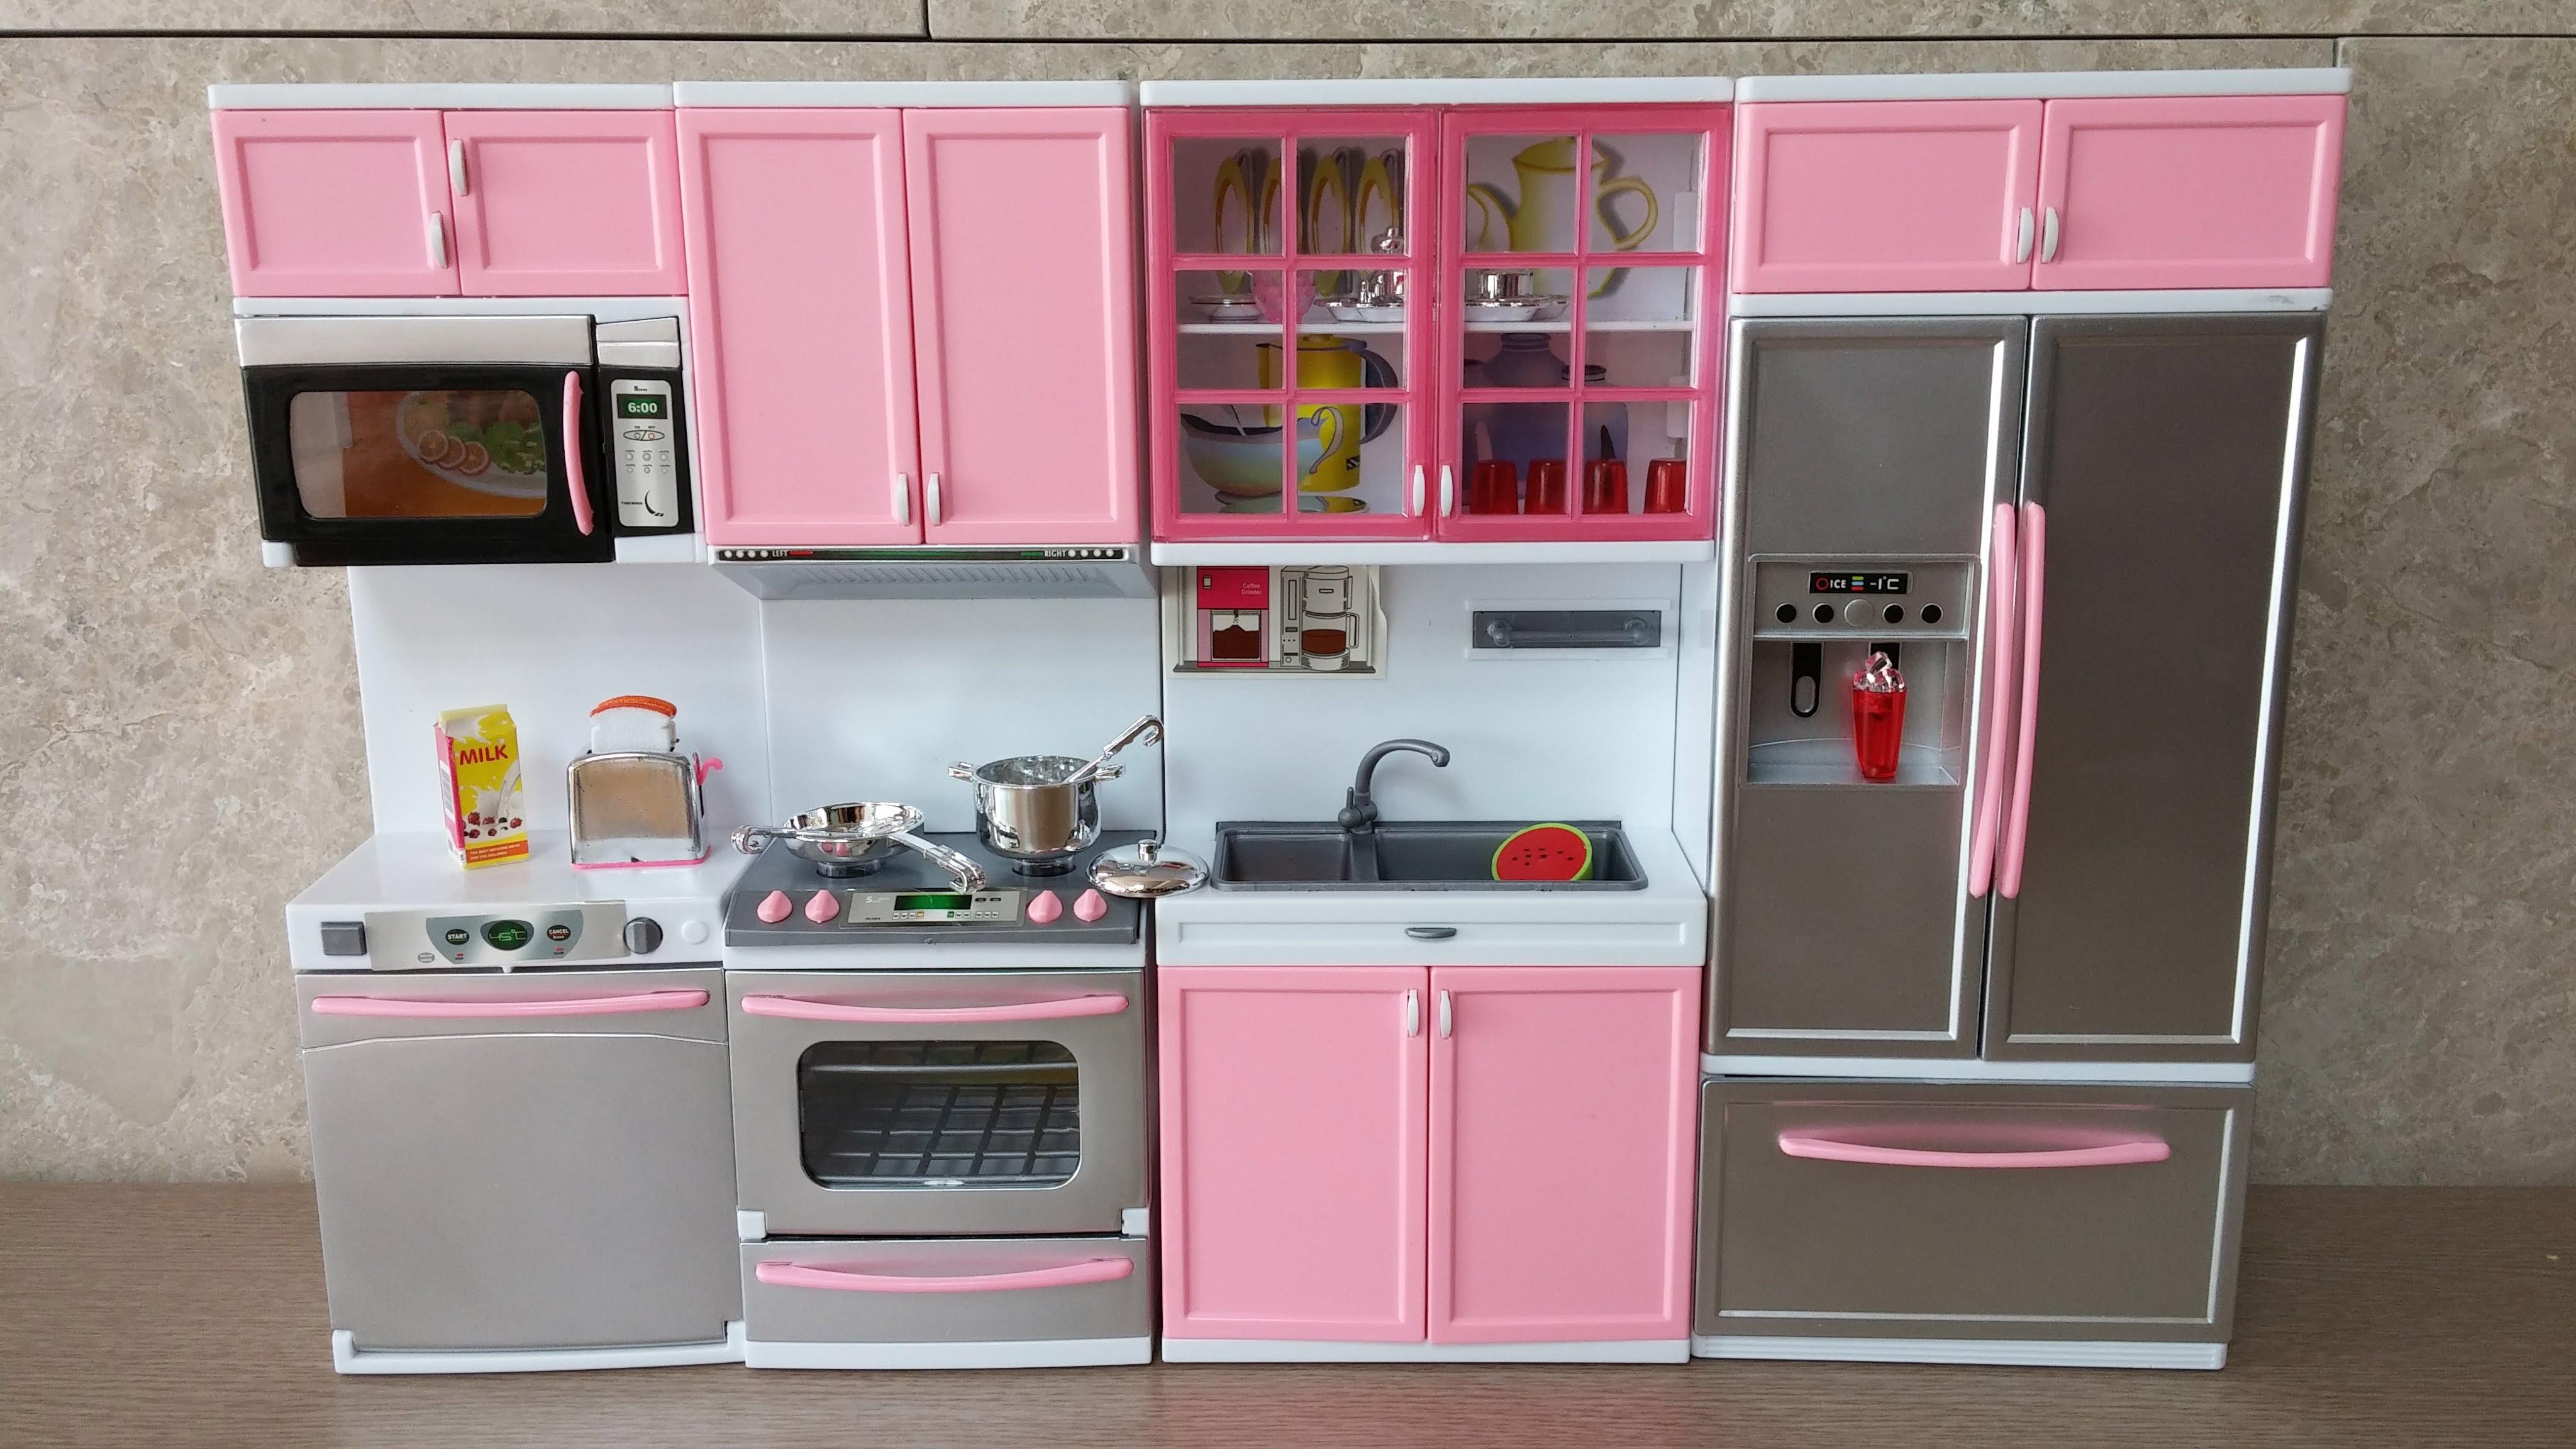 unpack kitchen sets new barbie kitchen set - deluxe modern toy kitchen - battery NMPHNWO